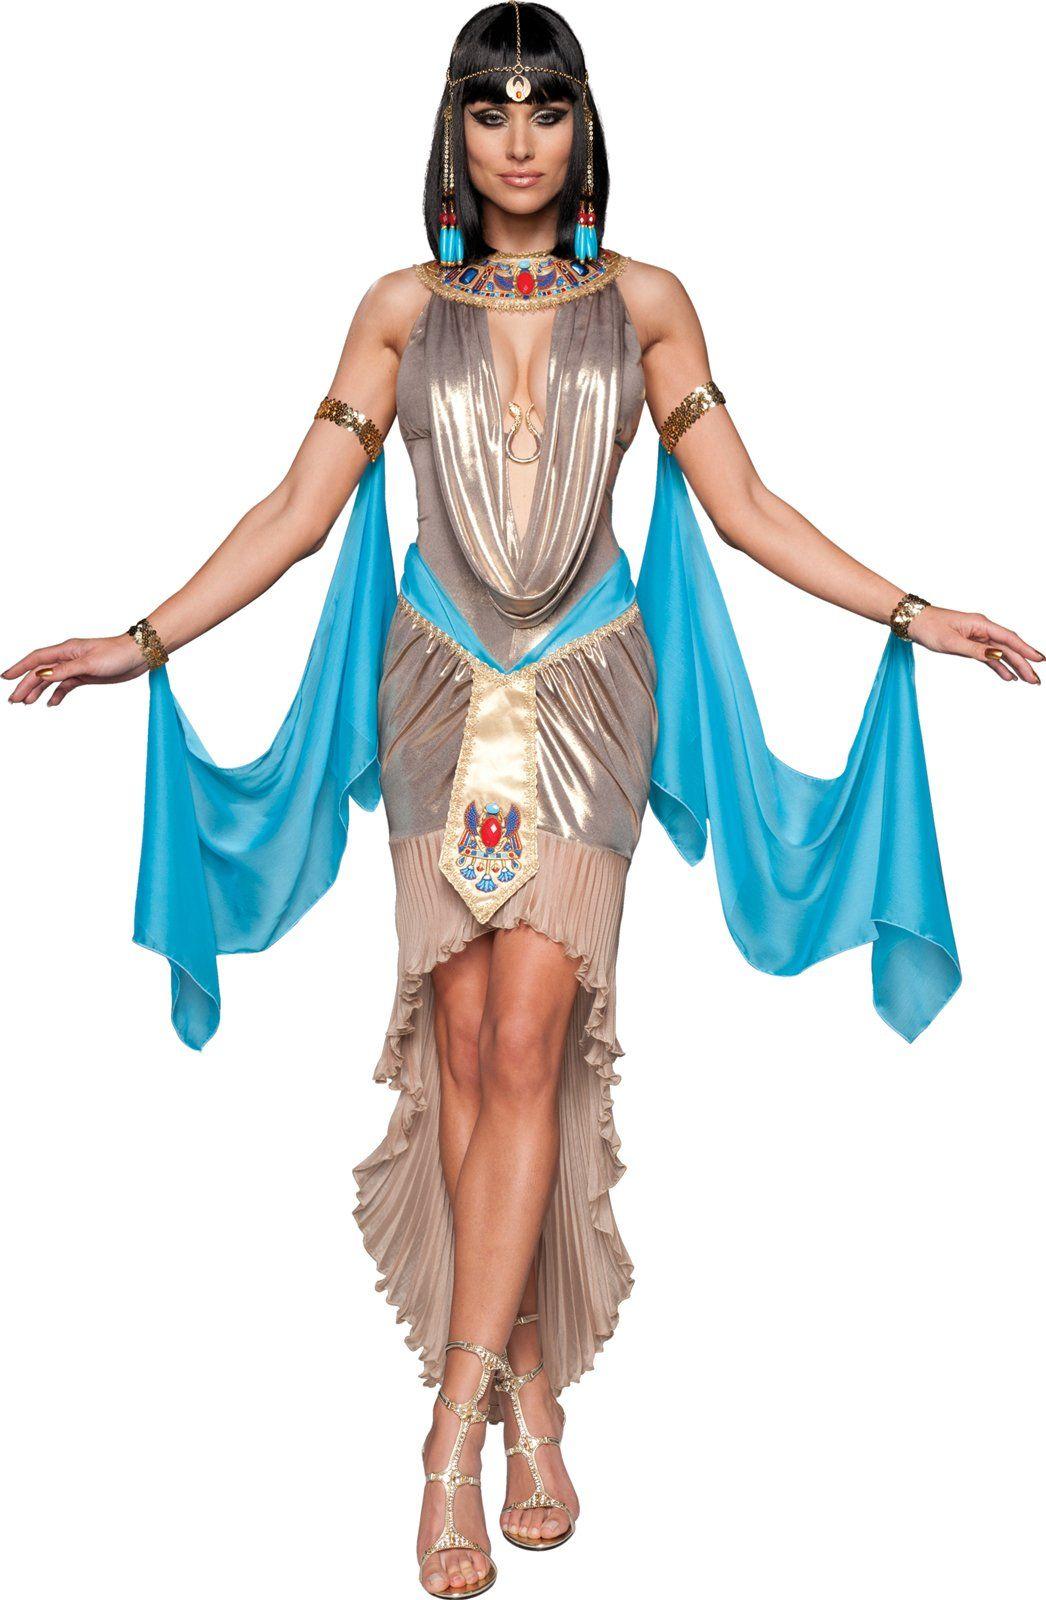 Pharaohs Treasure Adult Costume | Costumes, Halloween costumes and ...